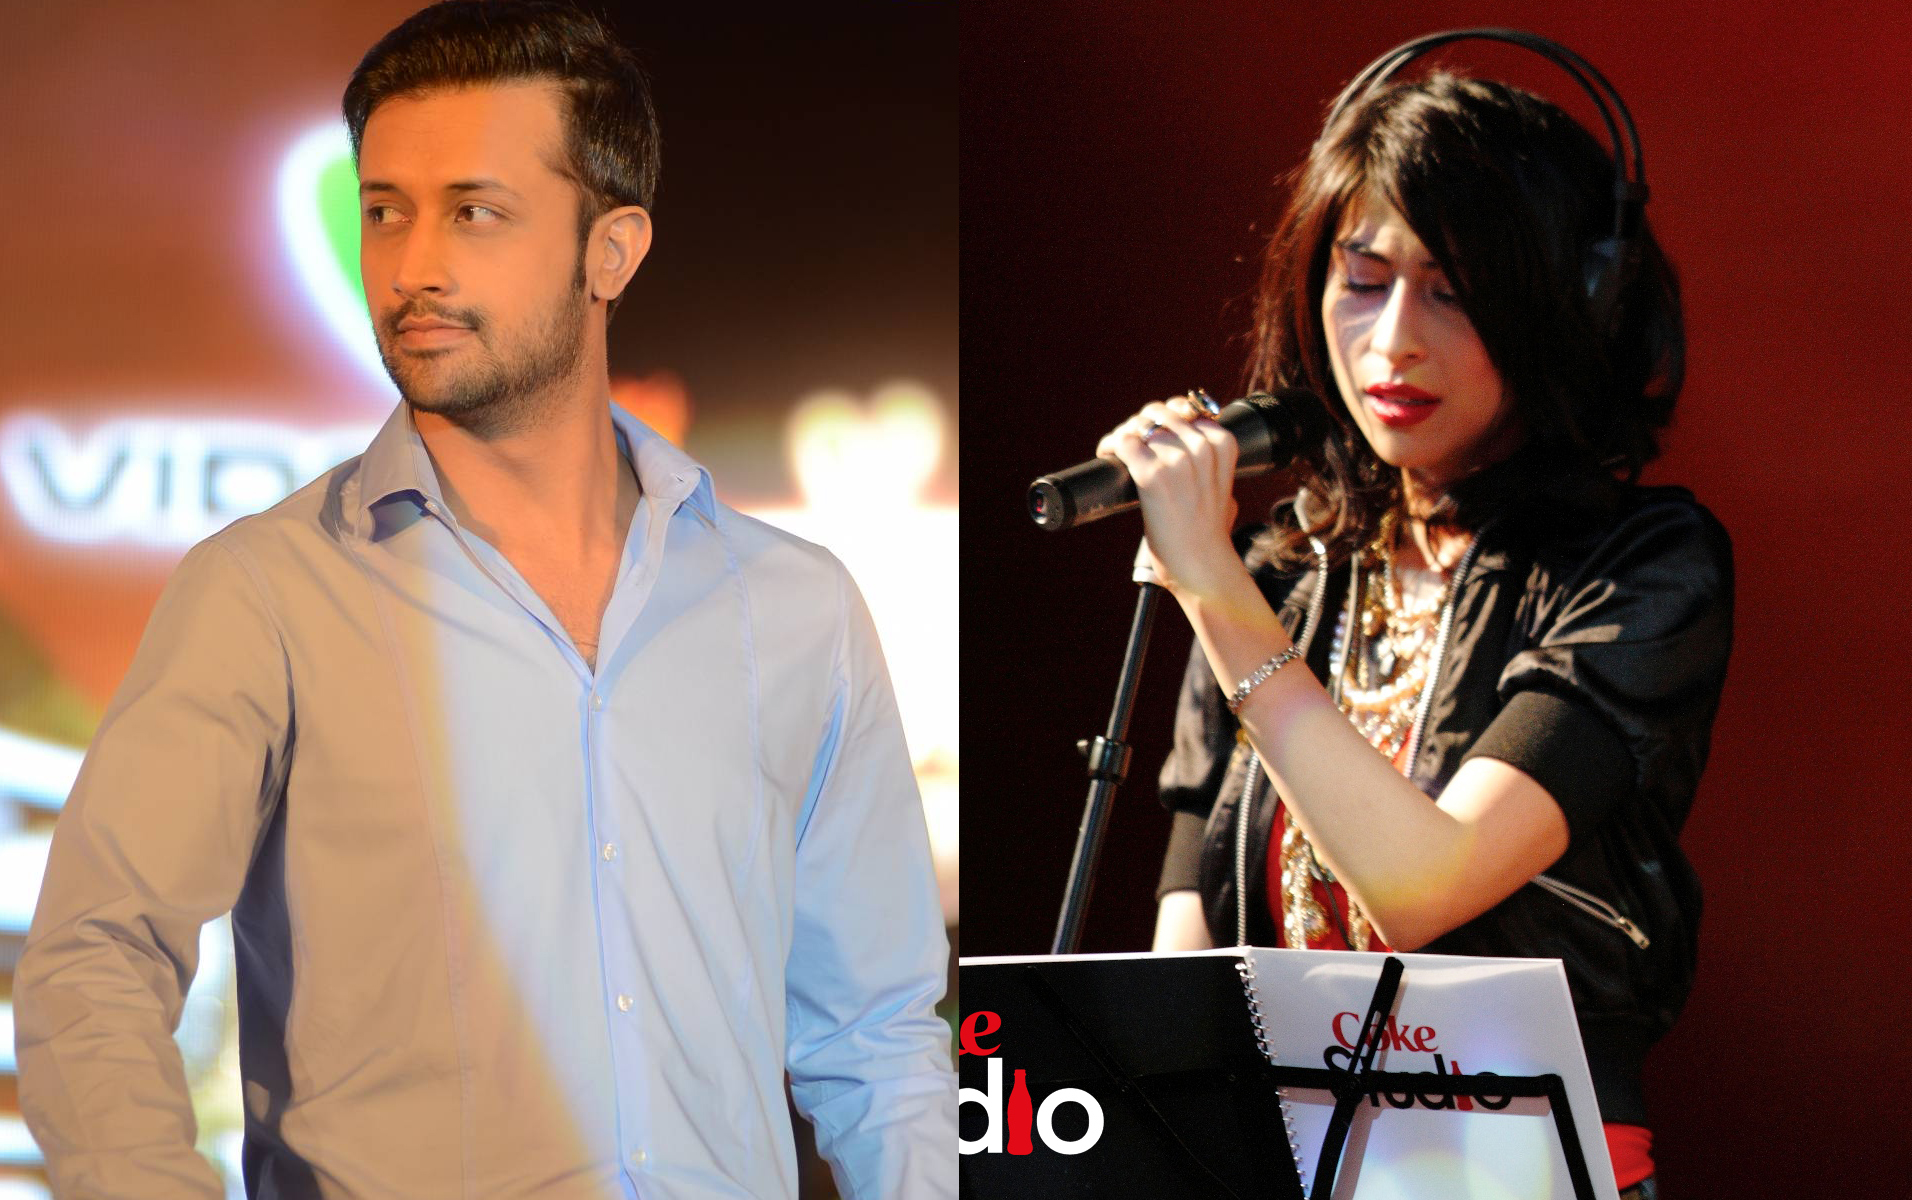 Atif Aslam and Meesha Shafi